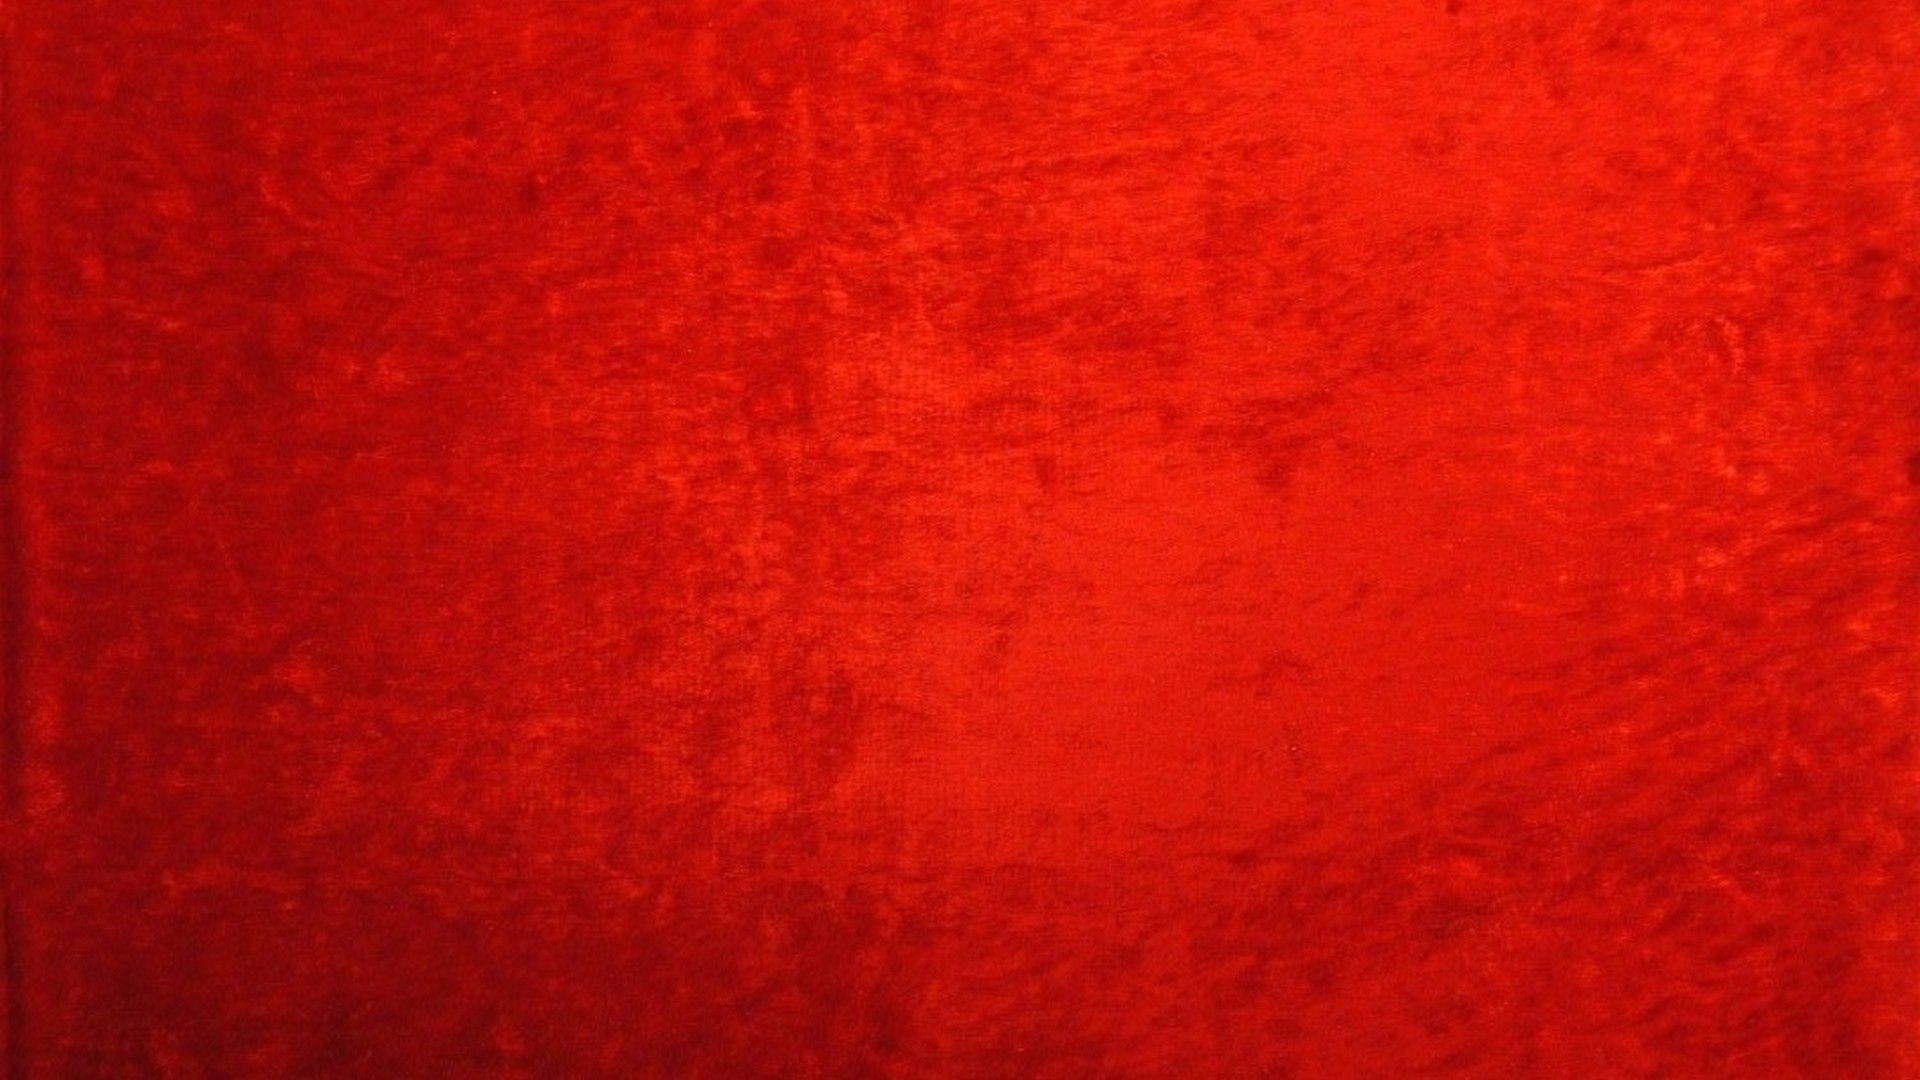 Red Hd Wallpaper Red Wallpaper Velvet Wallpaper Textured